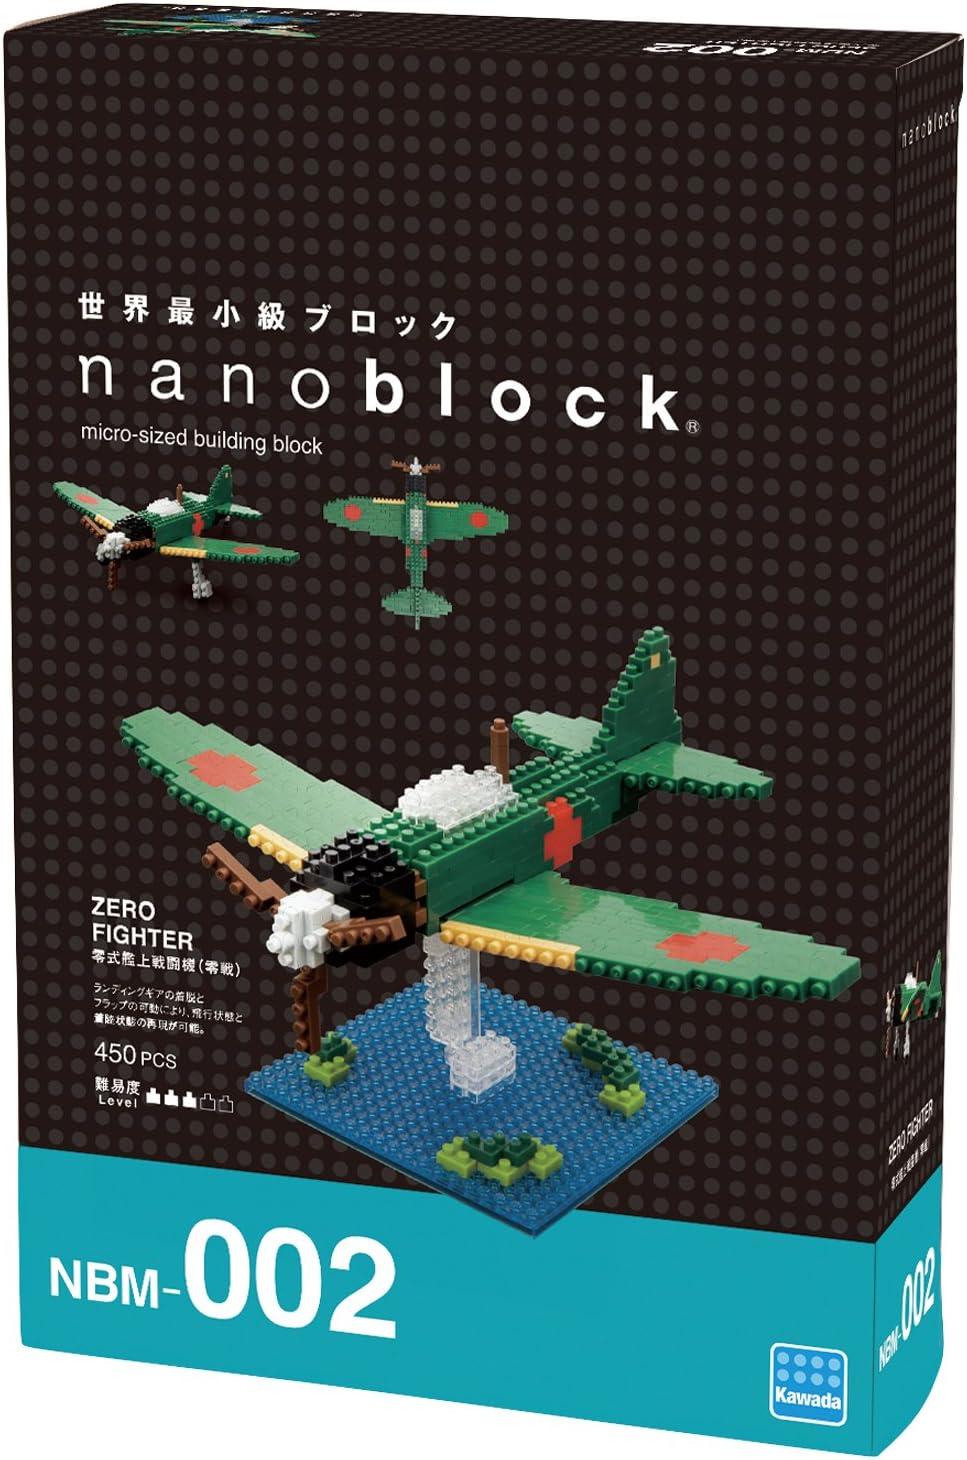 Kawada Nanoblock NBM-002 Zero Fighter 450pcs